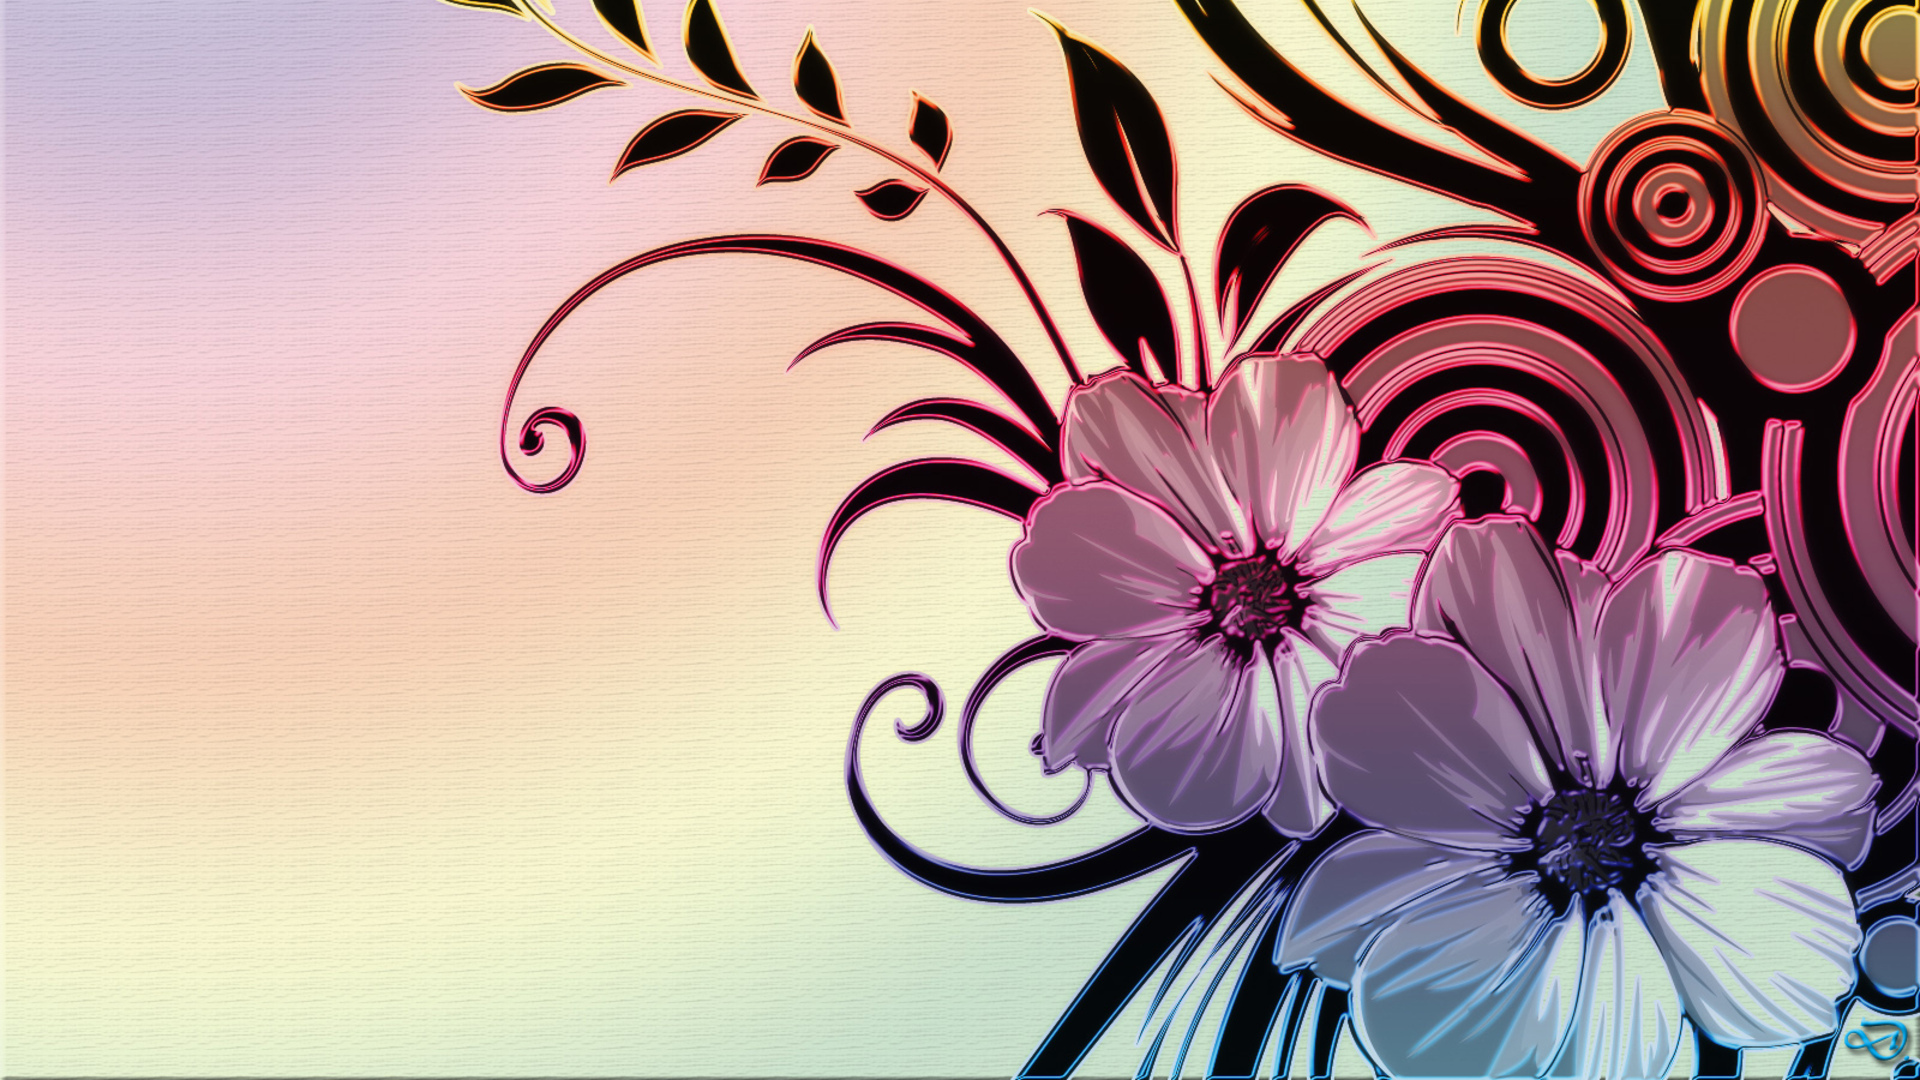 Flower wallpaper designs Download 3d HD colour design 1920x1080